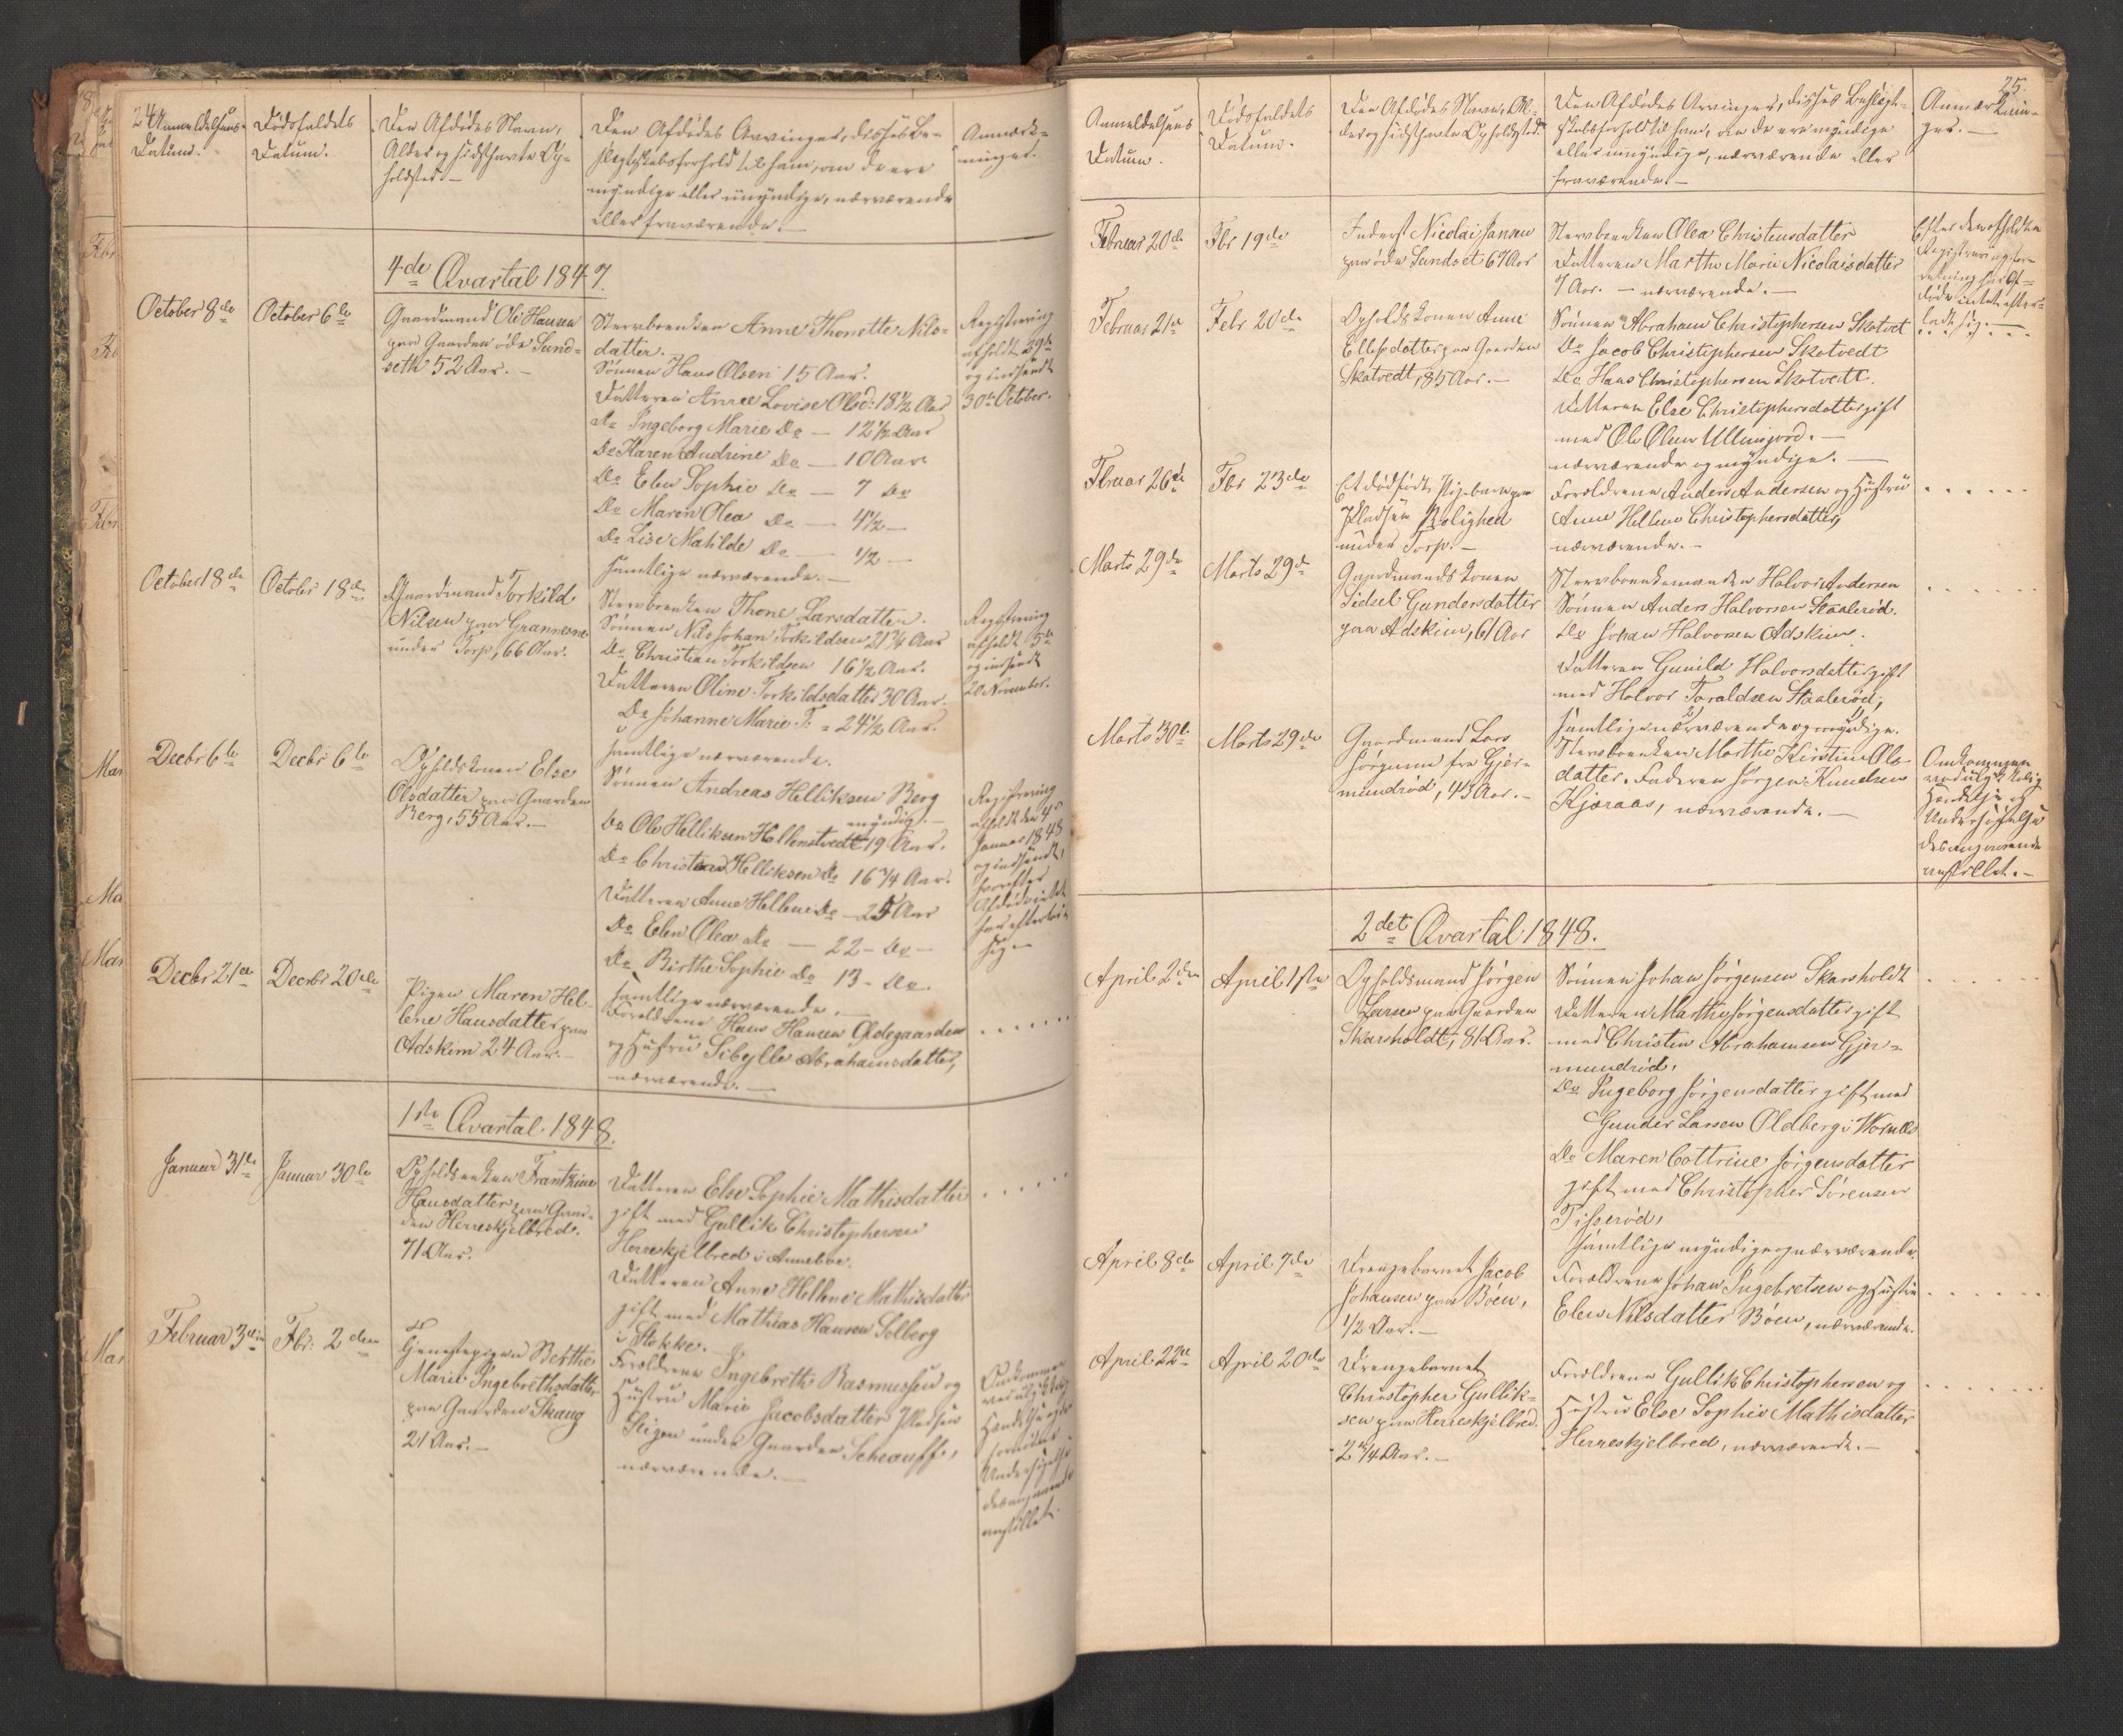 SAKO, Andebu lensmannskontor, H/Ha/L0001: Dødsfallsprotokoll, 1840-1899, s. 24-25